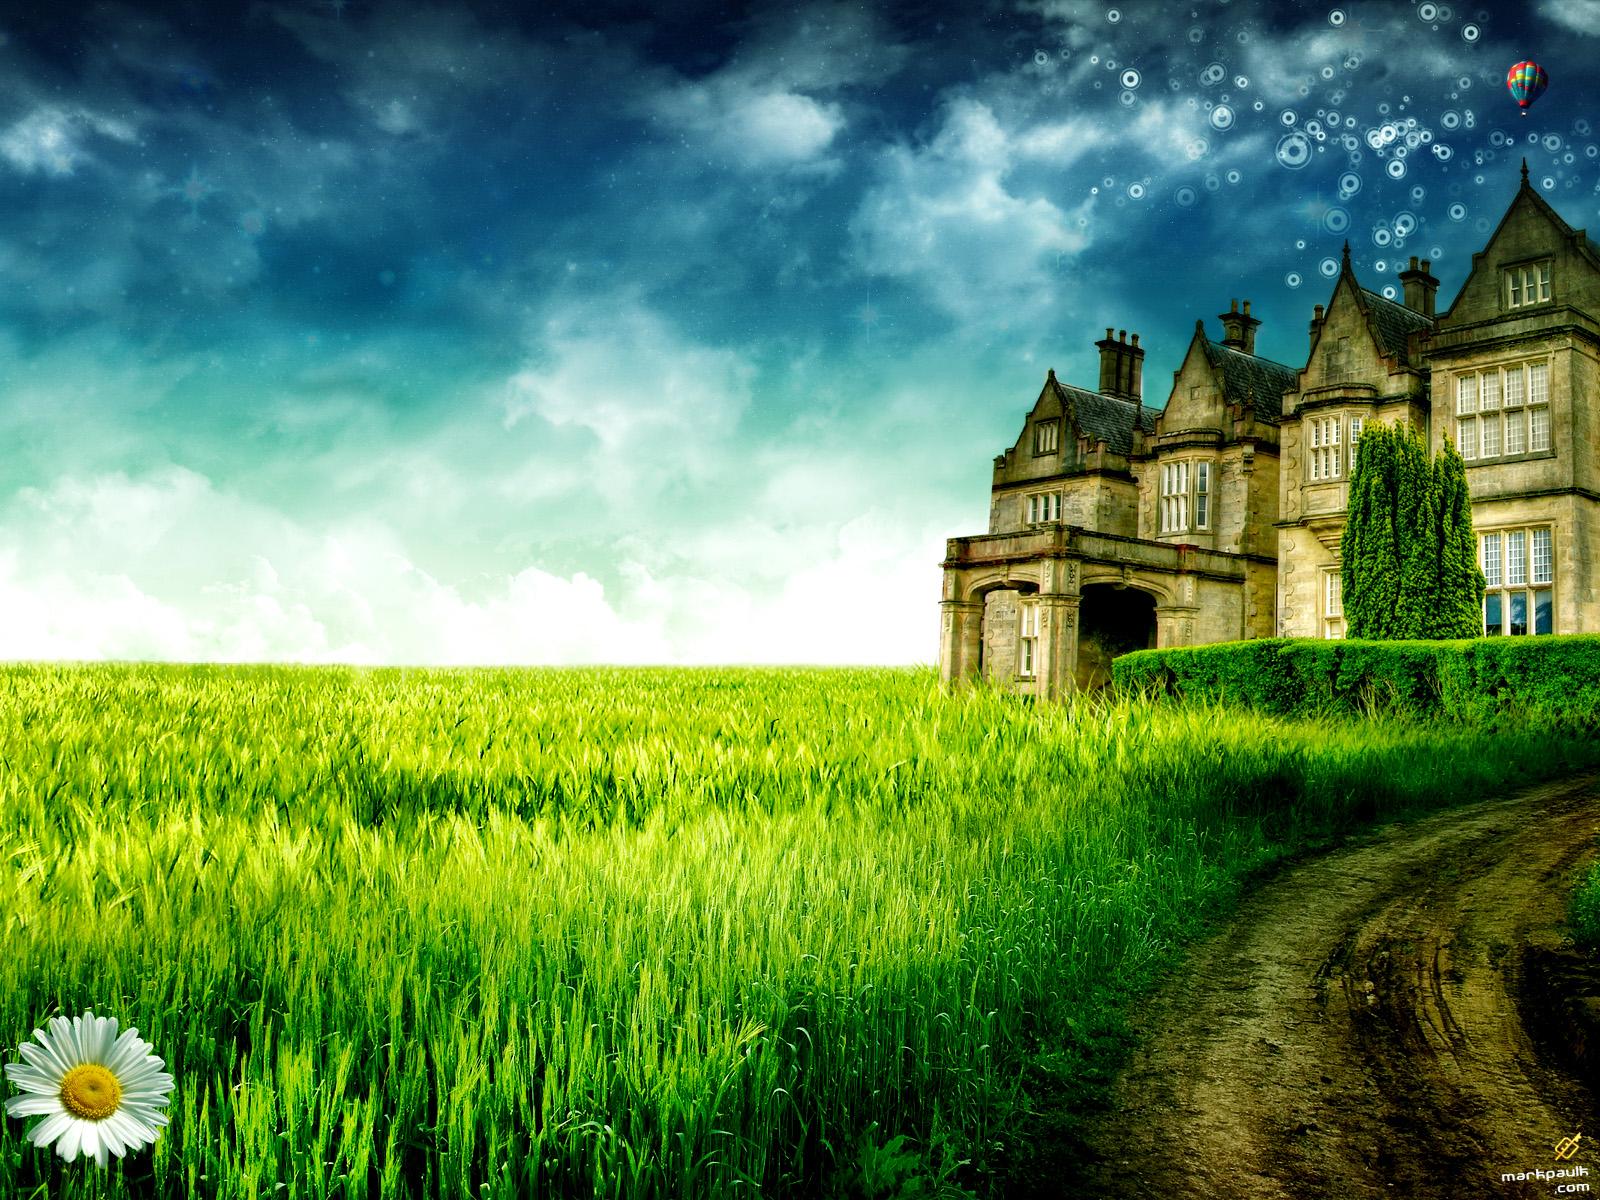 Beautiful Nature Sceneries Pics: Beautiful Nature Scenery